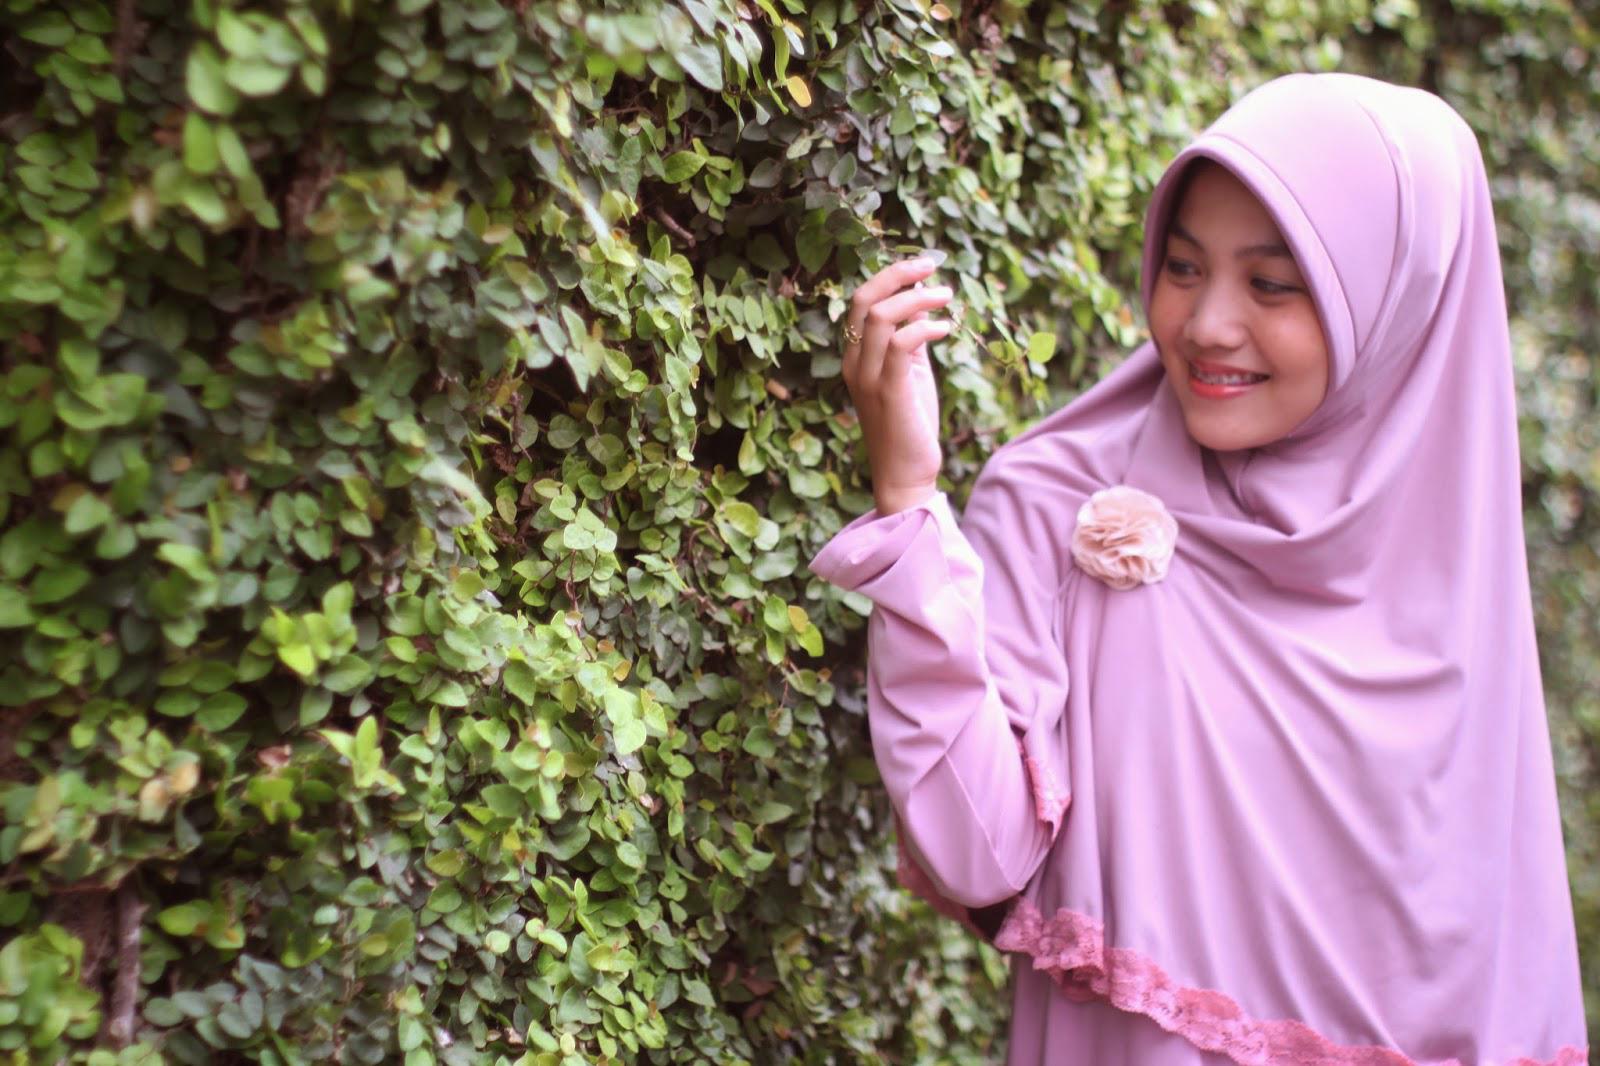 hijab Cewek IGO Efrida Yanti 86 hijab Cewek IGO Efrida Yanti 88 80s hijab Cewek IGO Efrida Yanti style